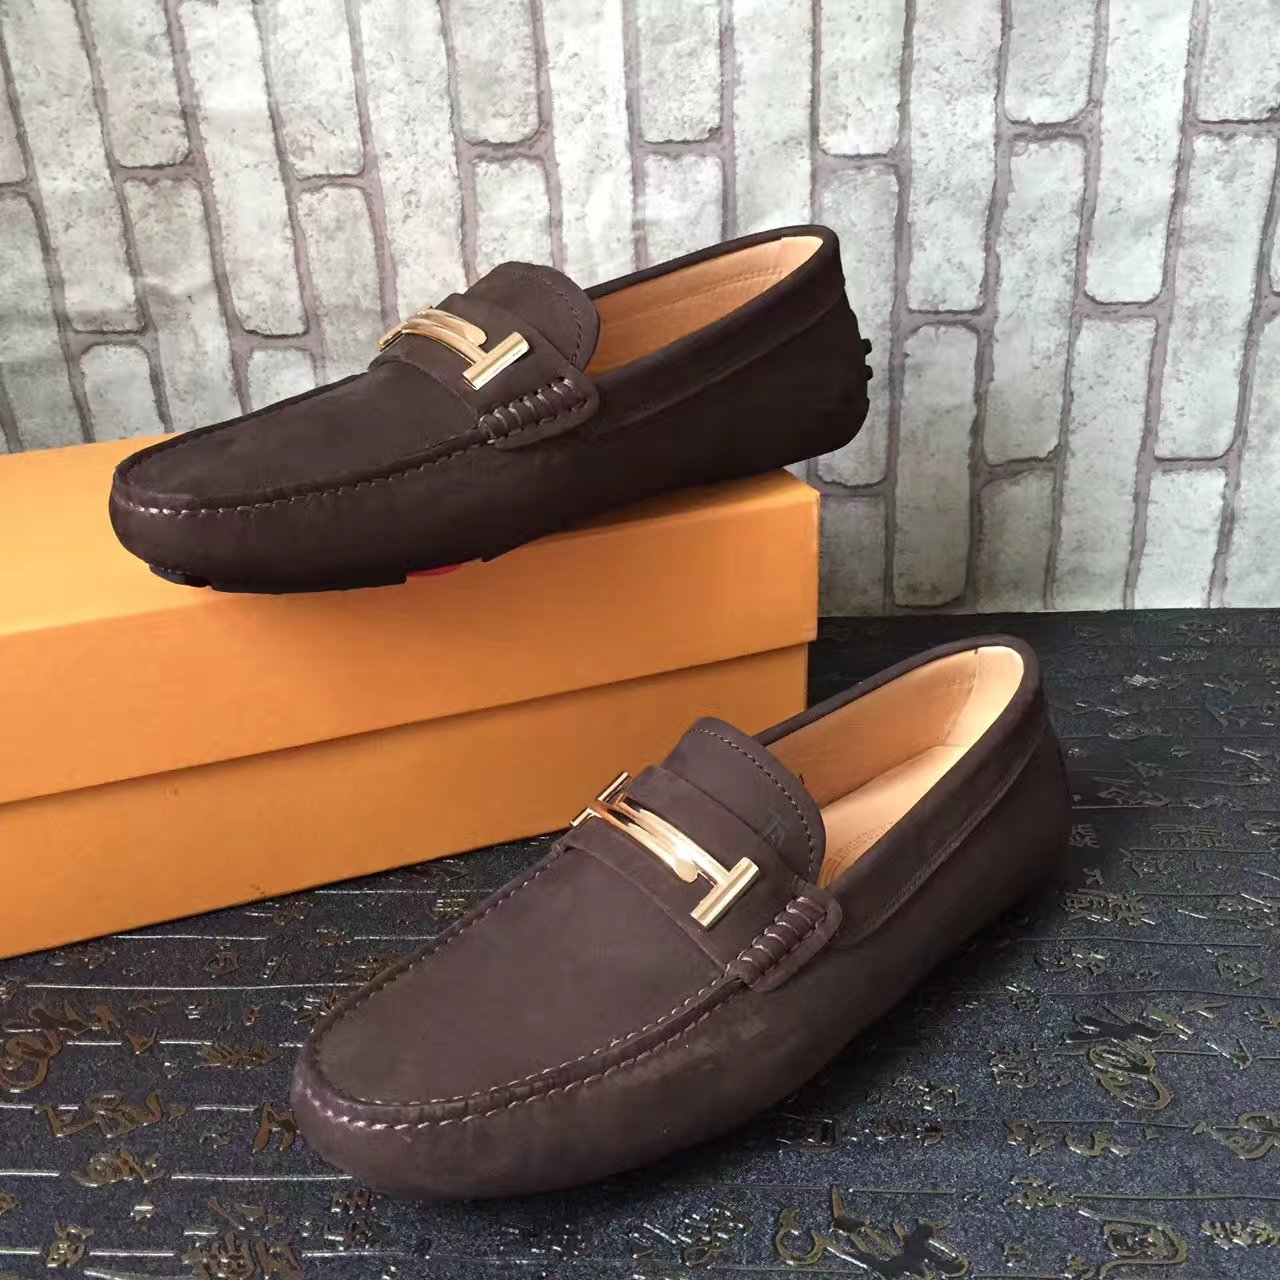 TODS托德斯2017 新款专柜同步上市 高品质 豆豆手工男鞋 开车鞋